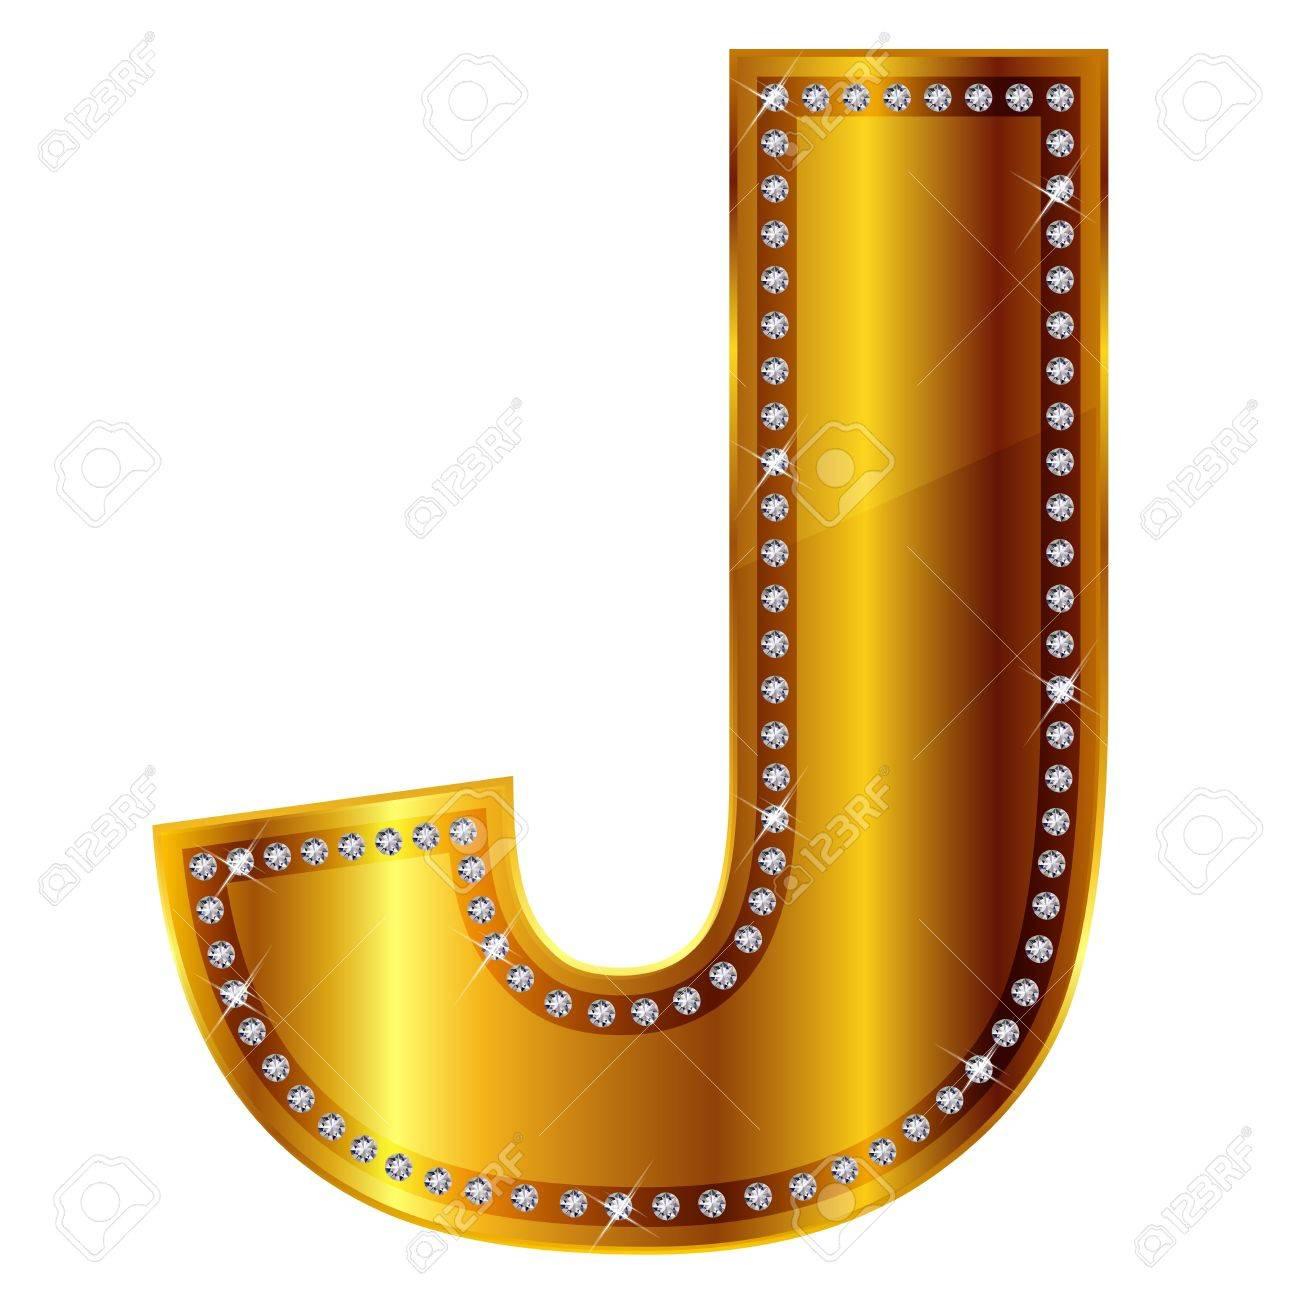 J Stock Vector - 15077943